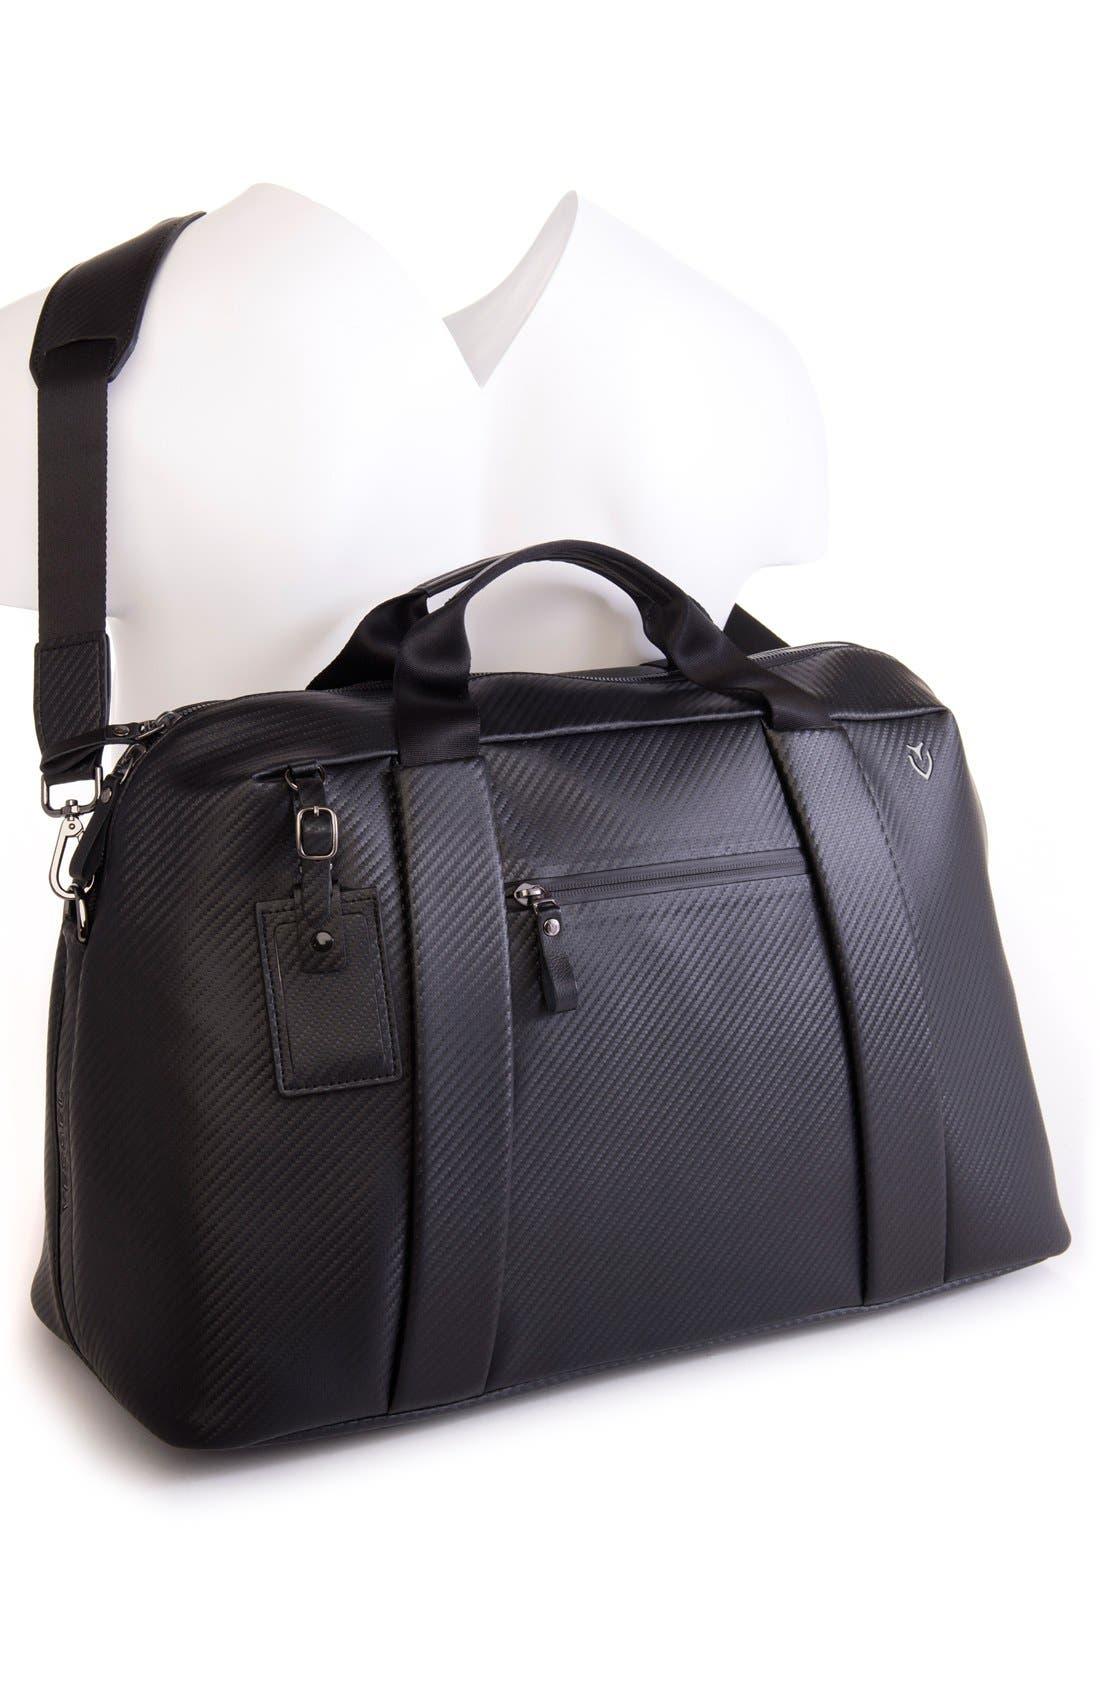 'Signature' Large Duffel Bag,                             Alternate thumbnail 2, color,                             CARBON BLACK